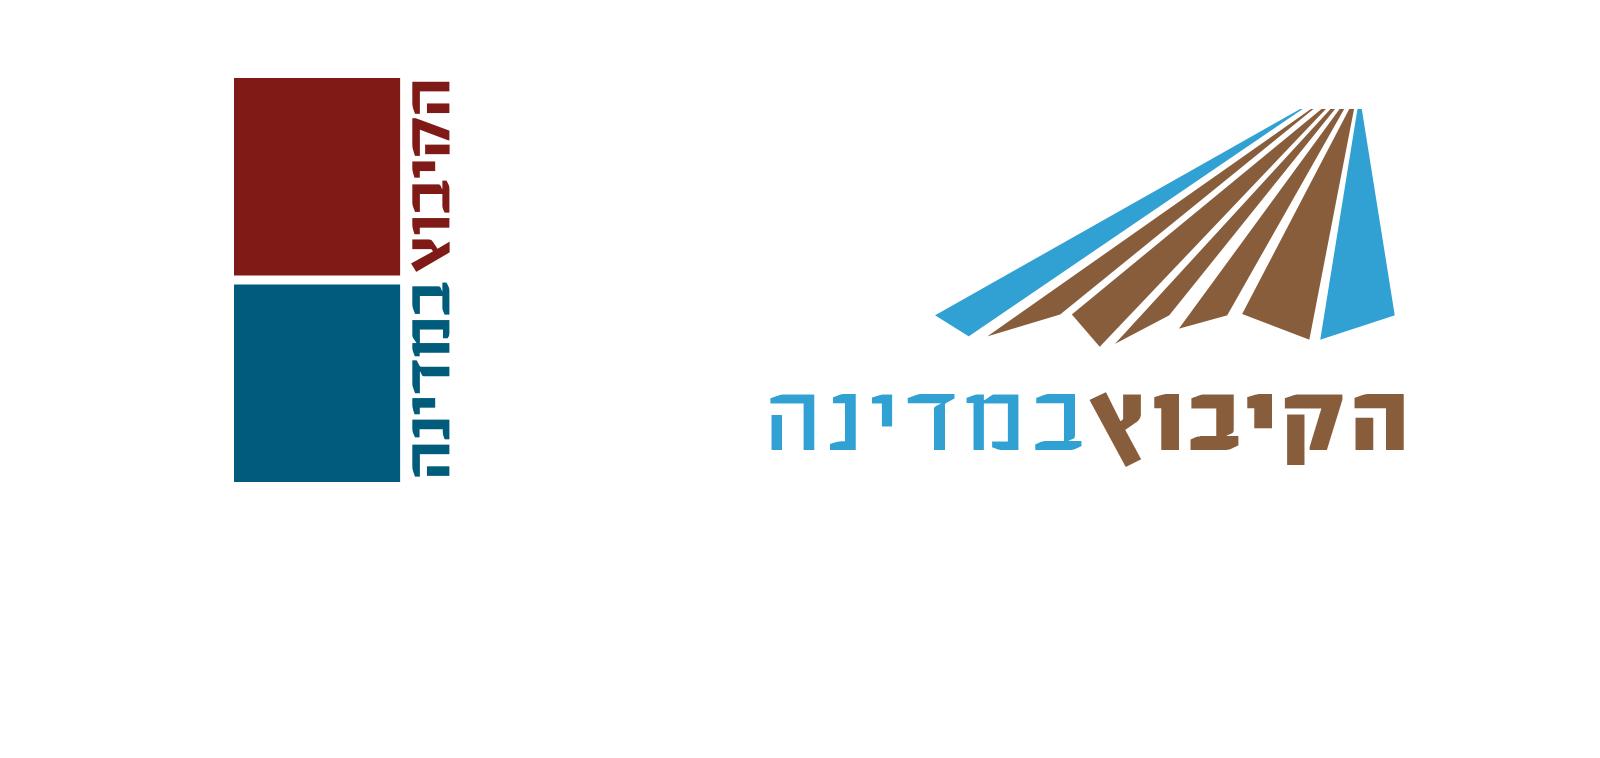 https://bigeyes.co.il/wp-content/uploads/2019/06/KibbutzBooks-logo-2.png